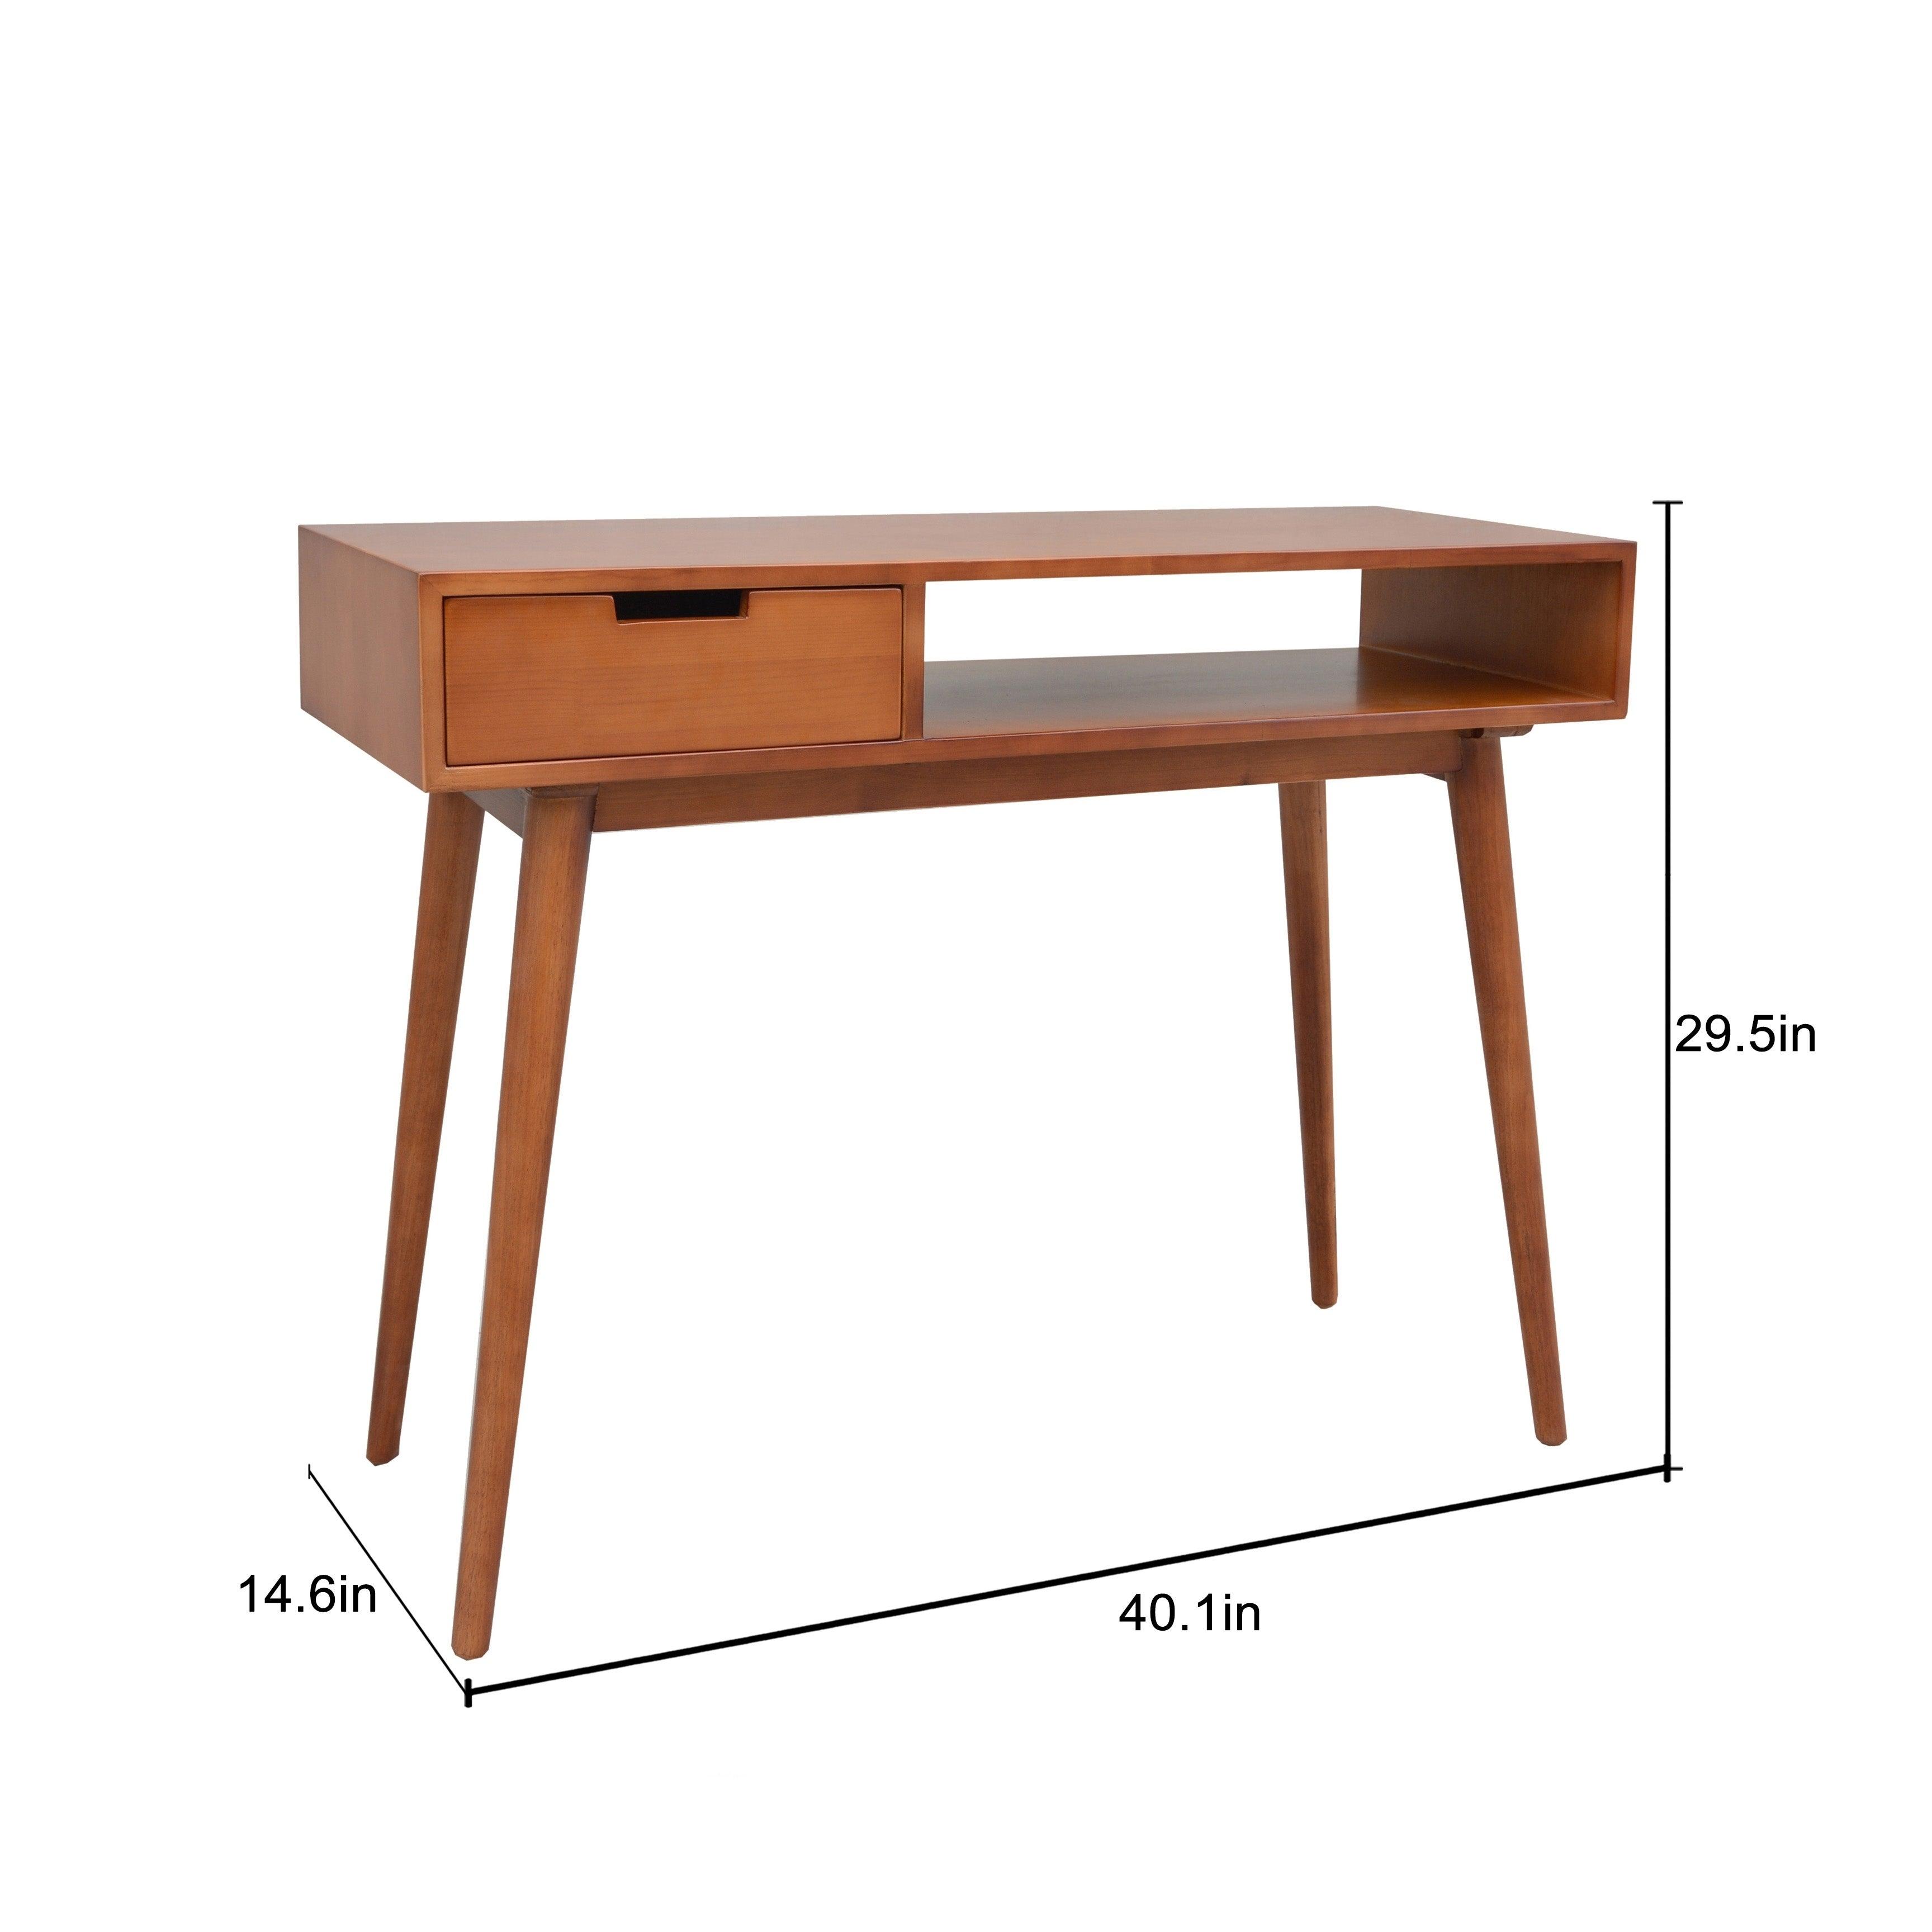 Shop Porthos Home Aceline Mid-Century Console Table - On Sale - Free ...